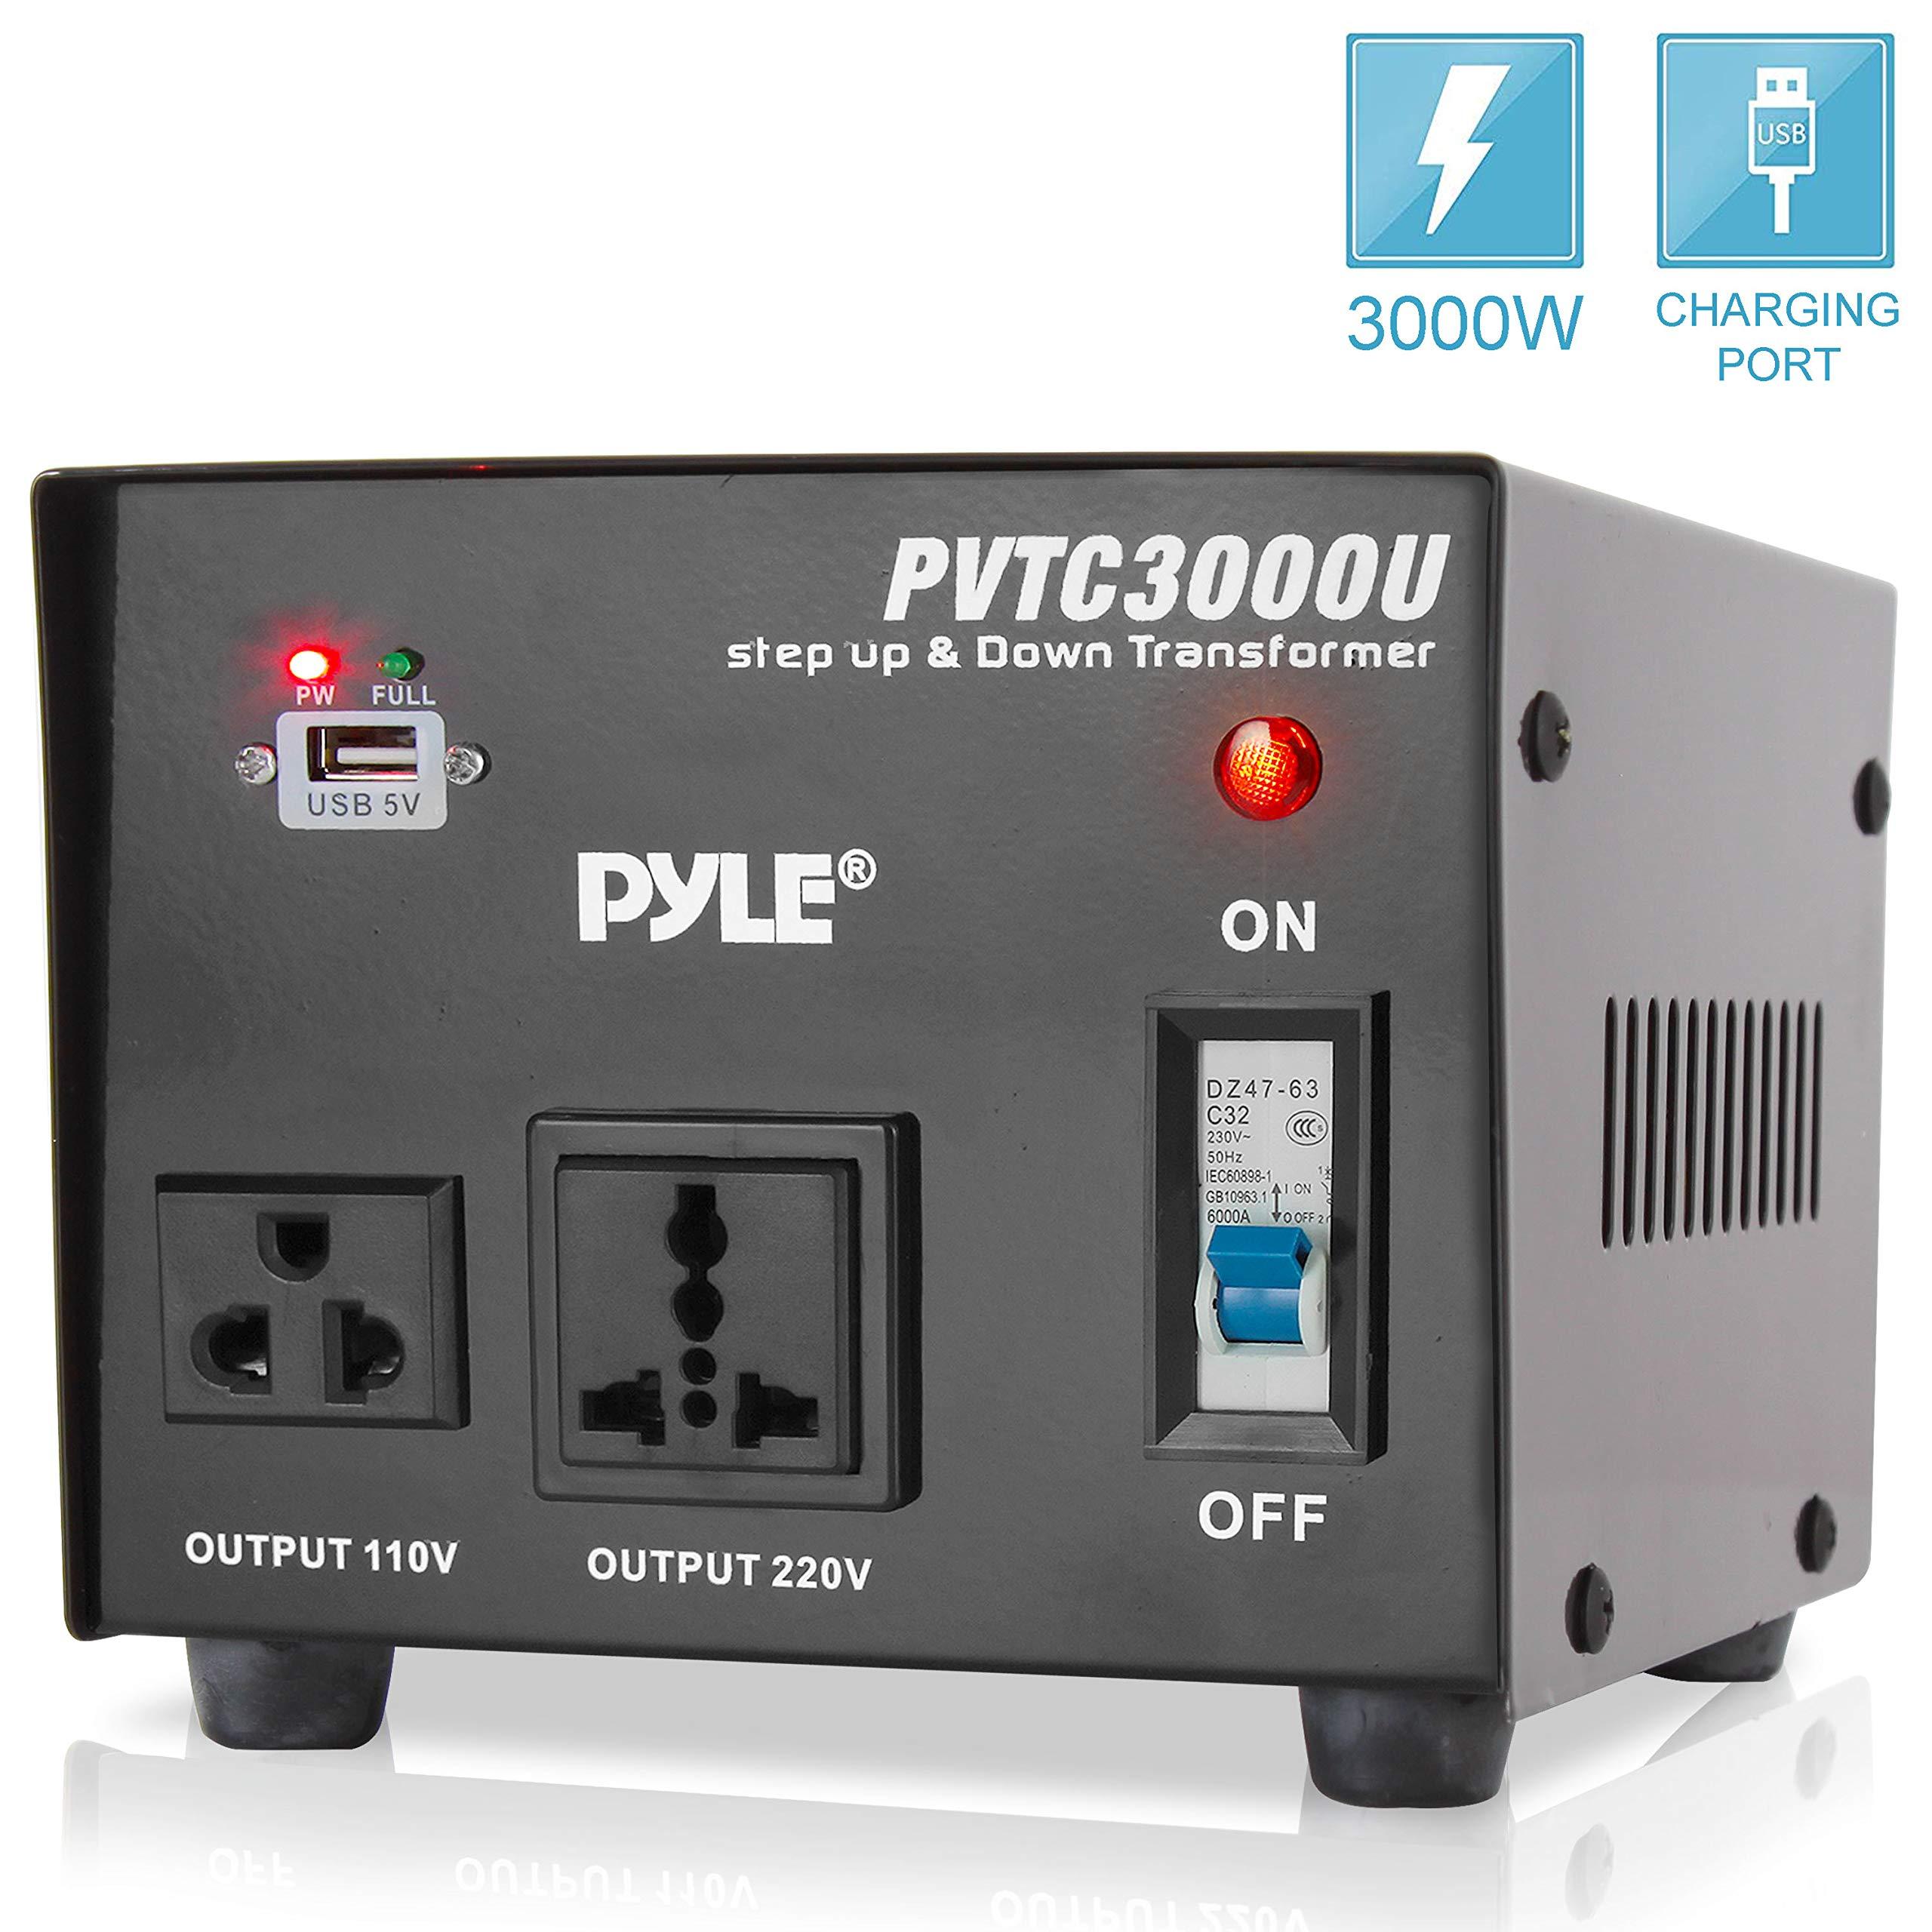 Pyle 2 Plug voltage converter Step Up and Down AC 110/220 Volts Transformer USB Charging Port, 3000 Watt